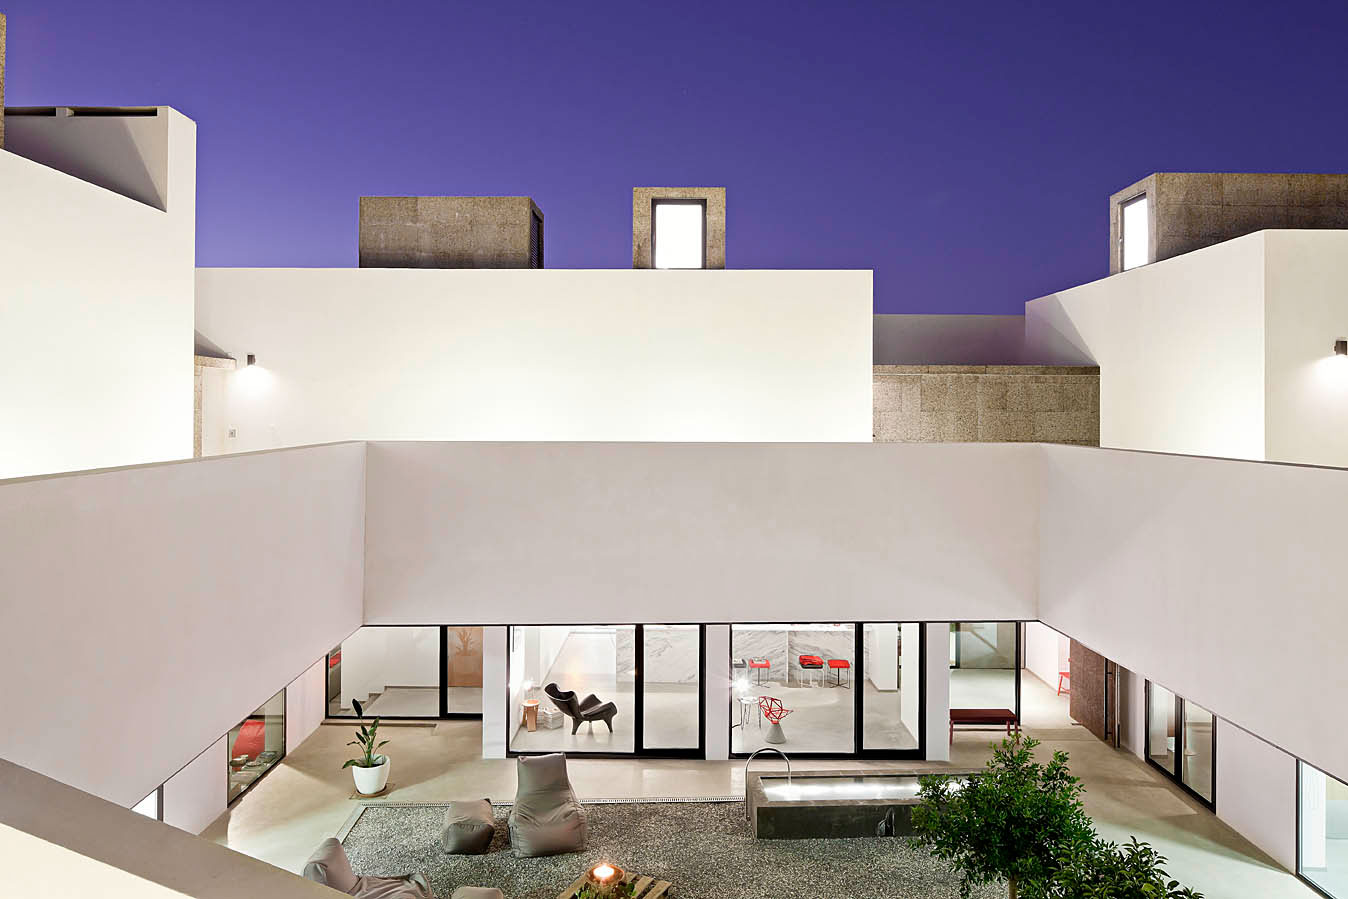 villa extramuros au portugal. Black Bedroom Furniture Sets. Home Design Ideas